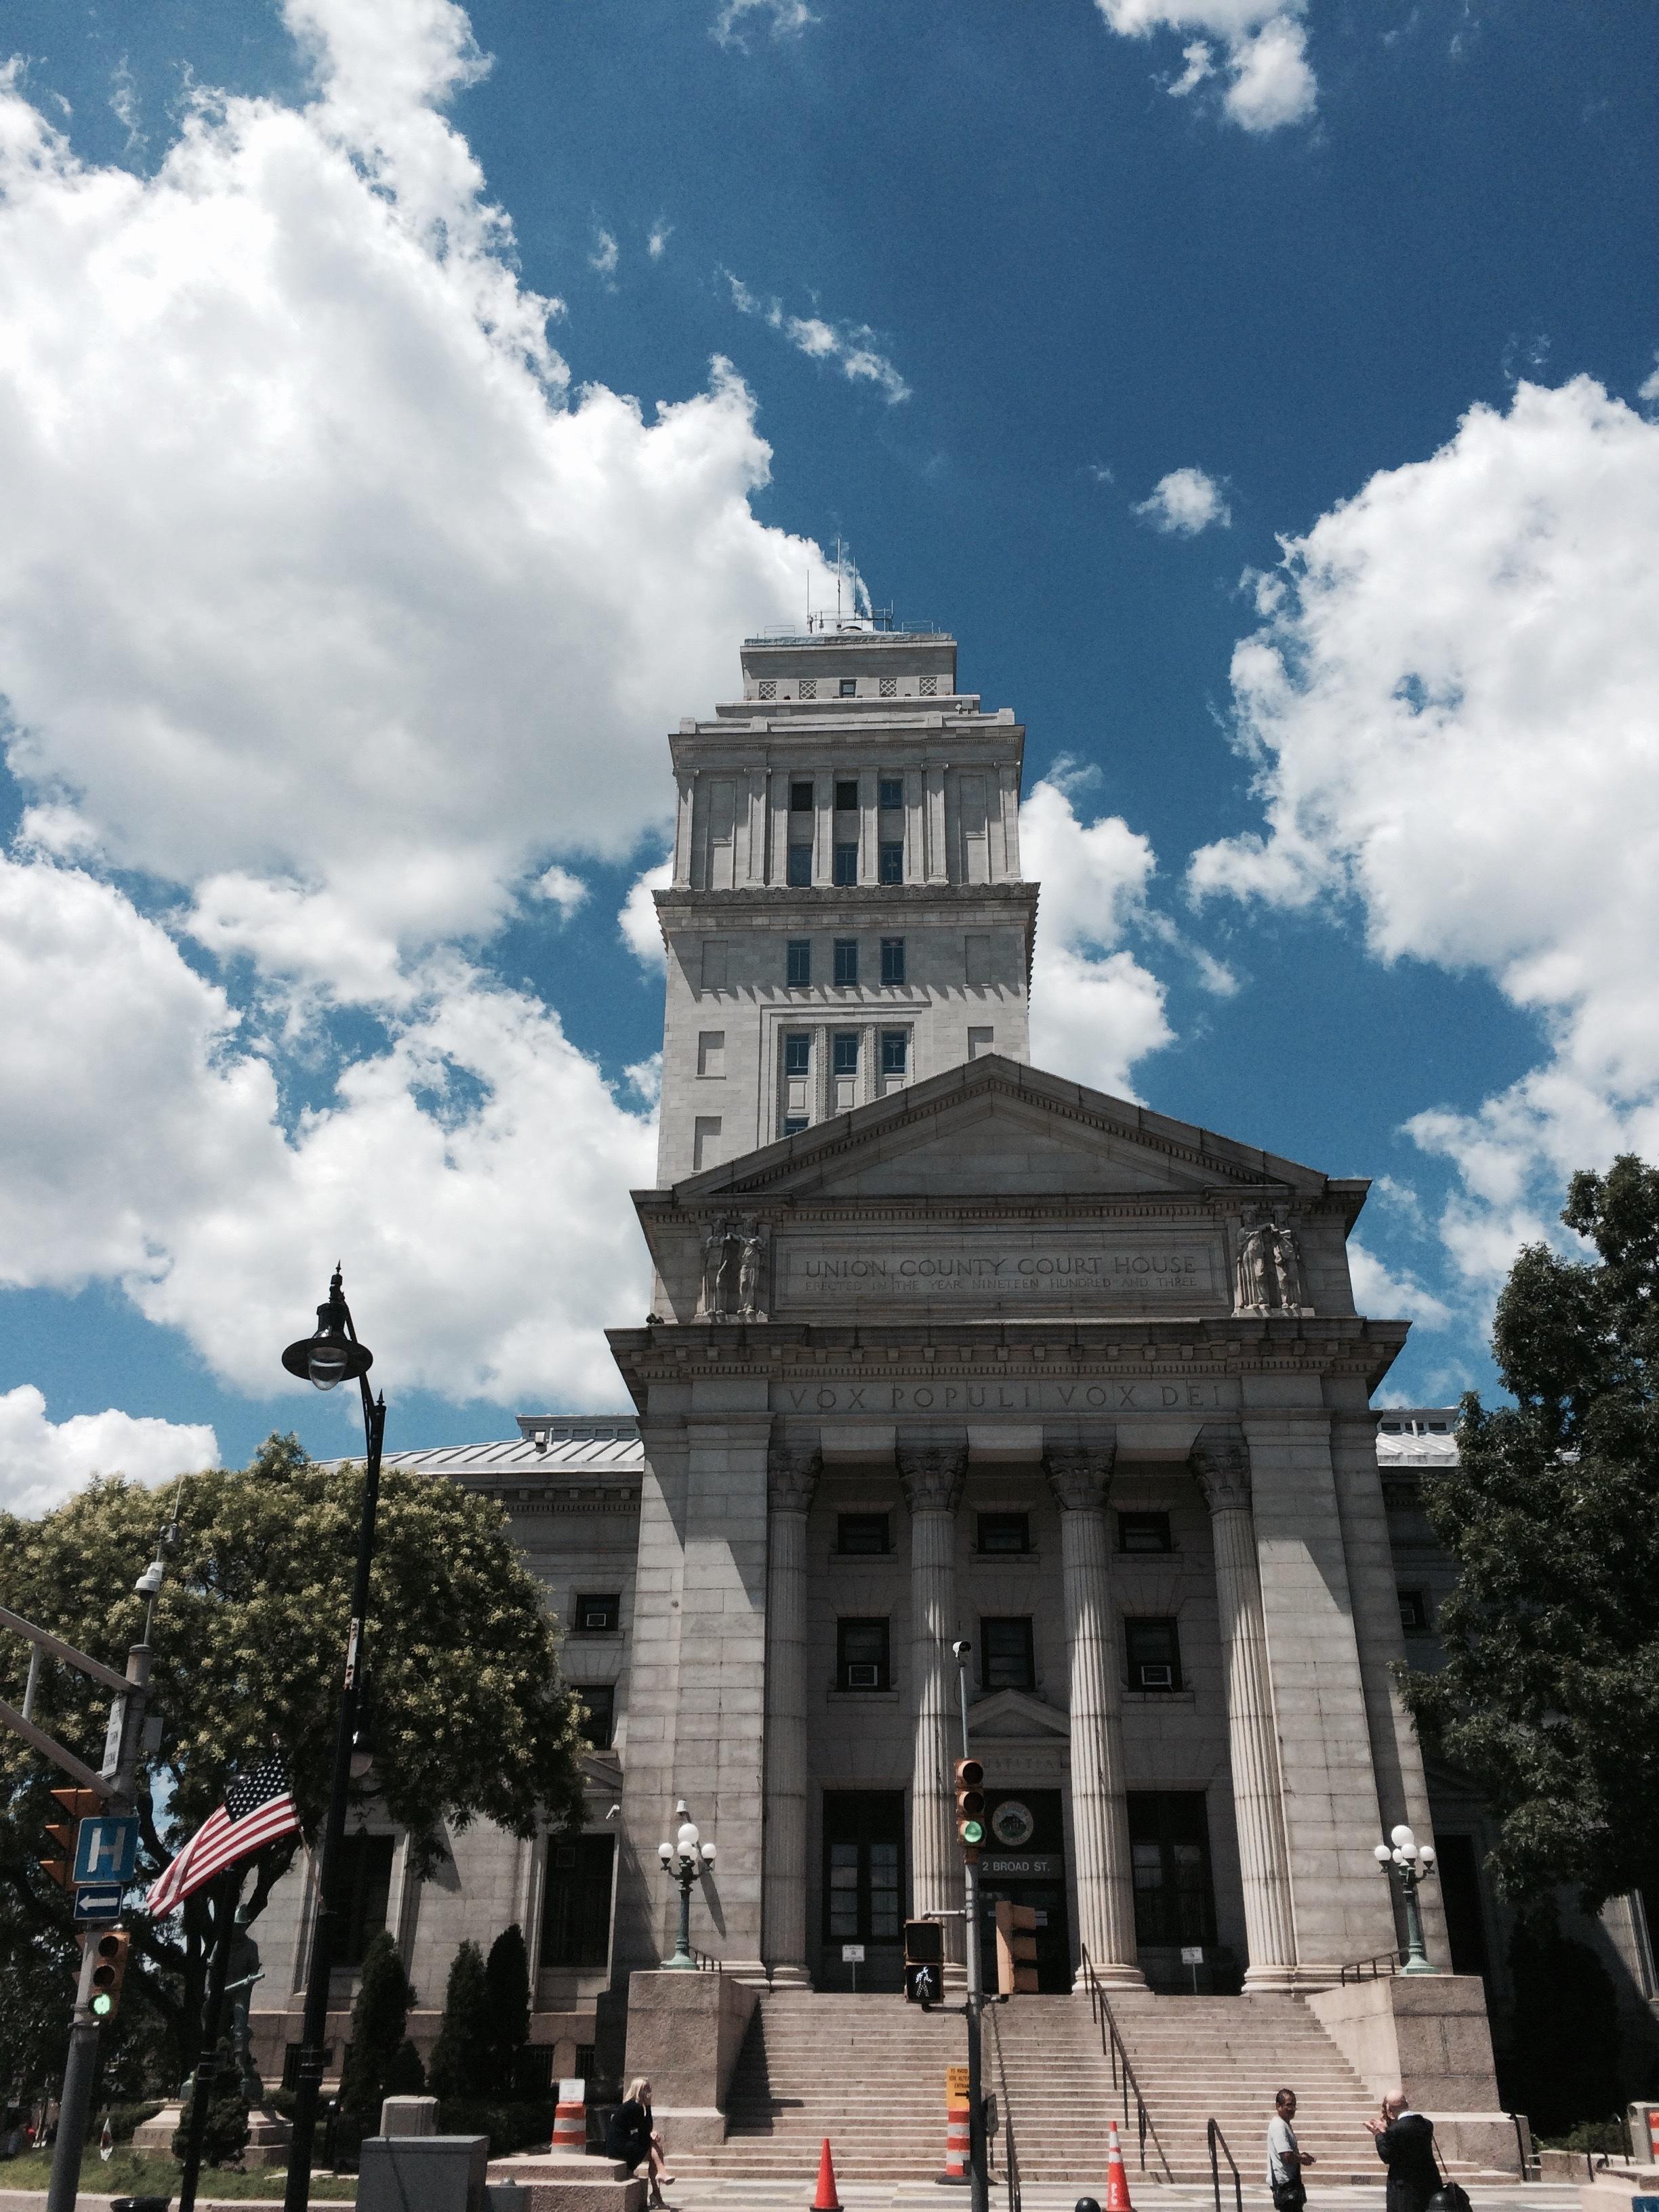 41807dd8e6d990083937_Union_County_Courthouse_August_2015.jpg